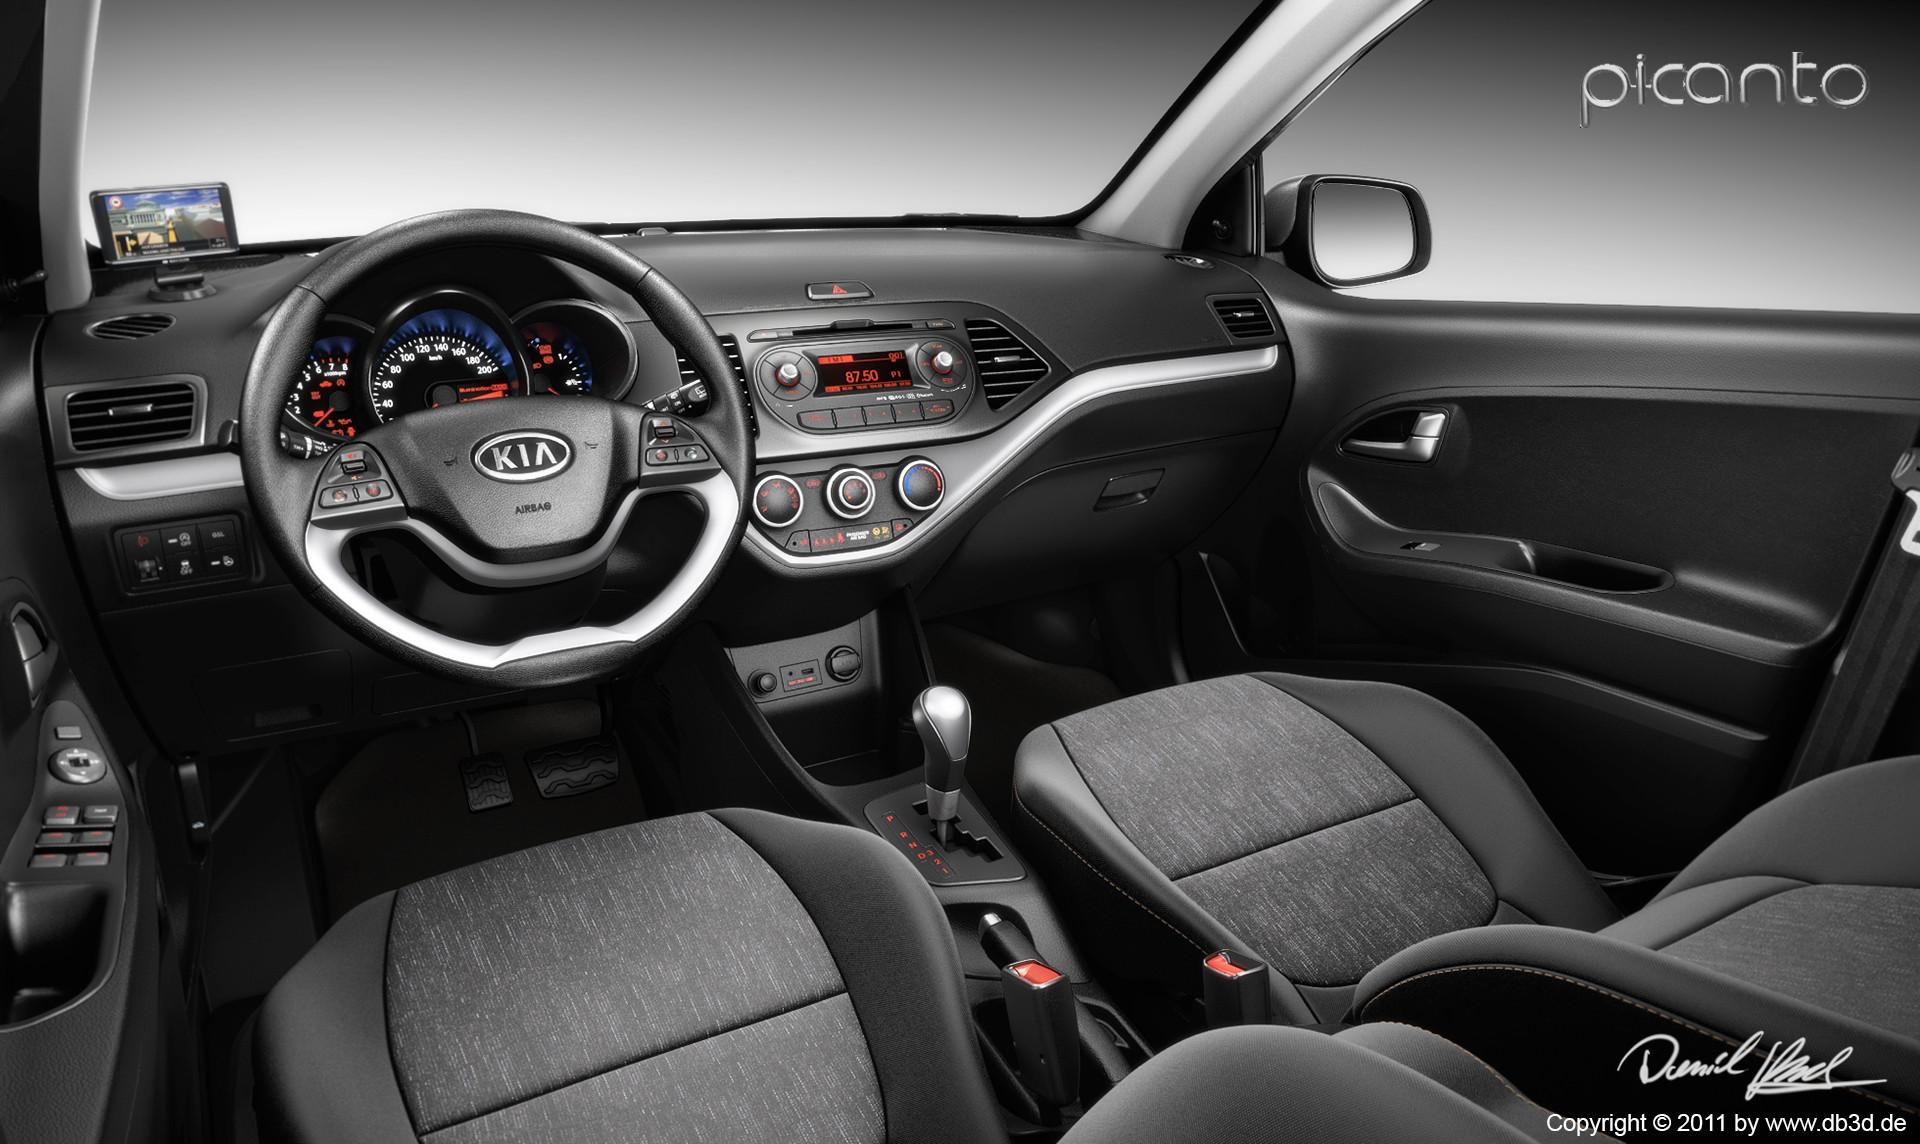 Daniel Brok - KIA Picanto Car Interior